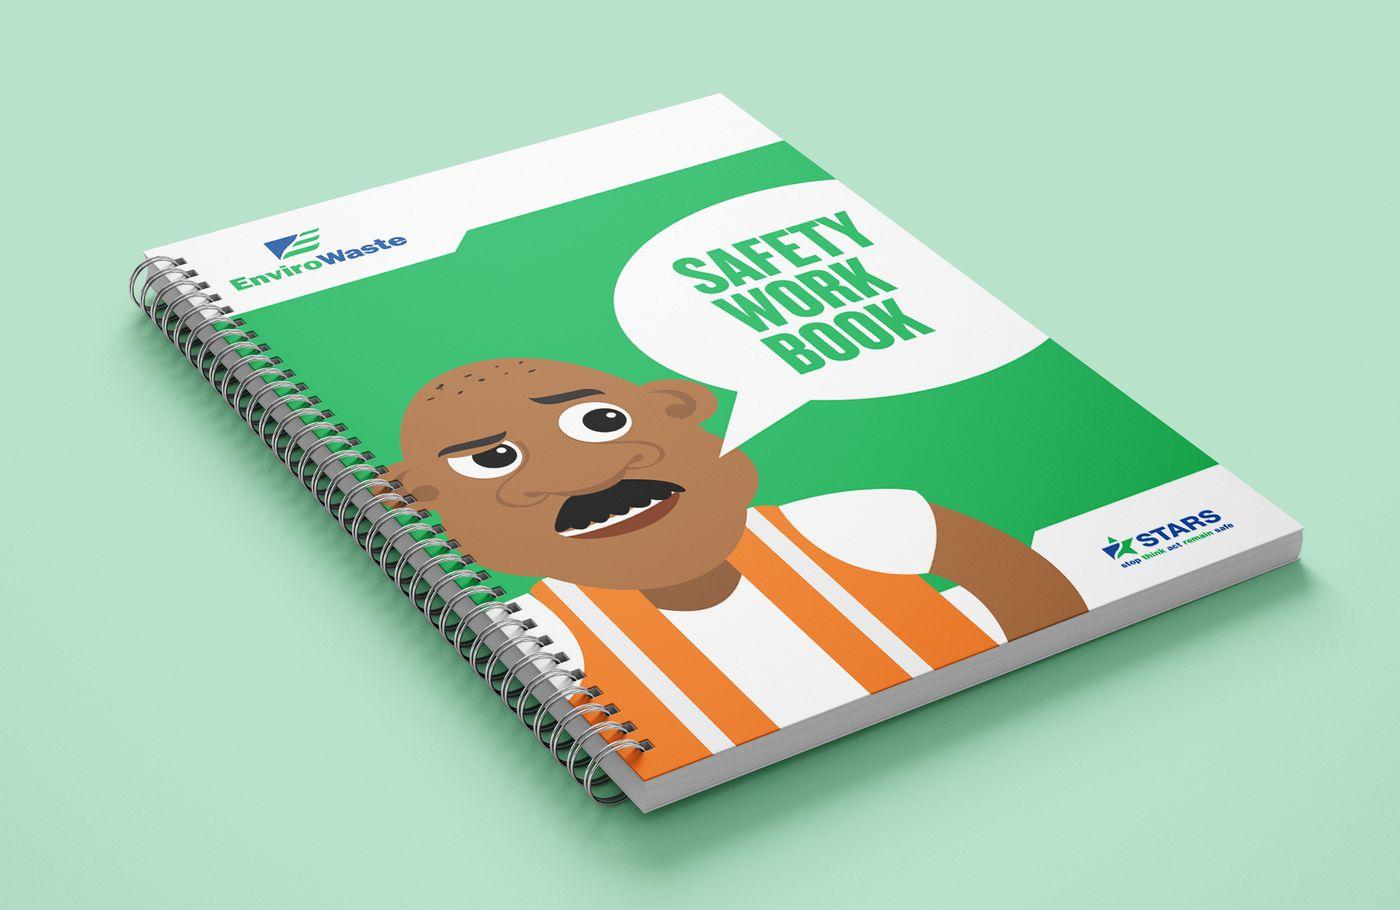 EnviroWaste Saftey Work Book Cover